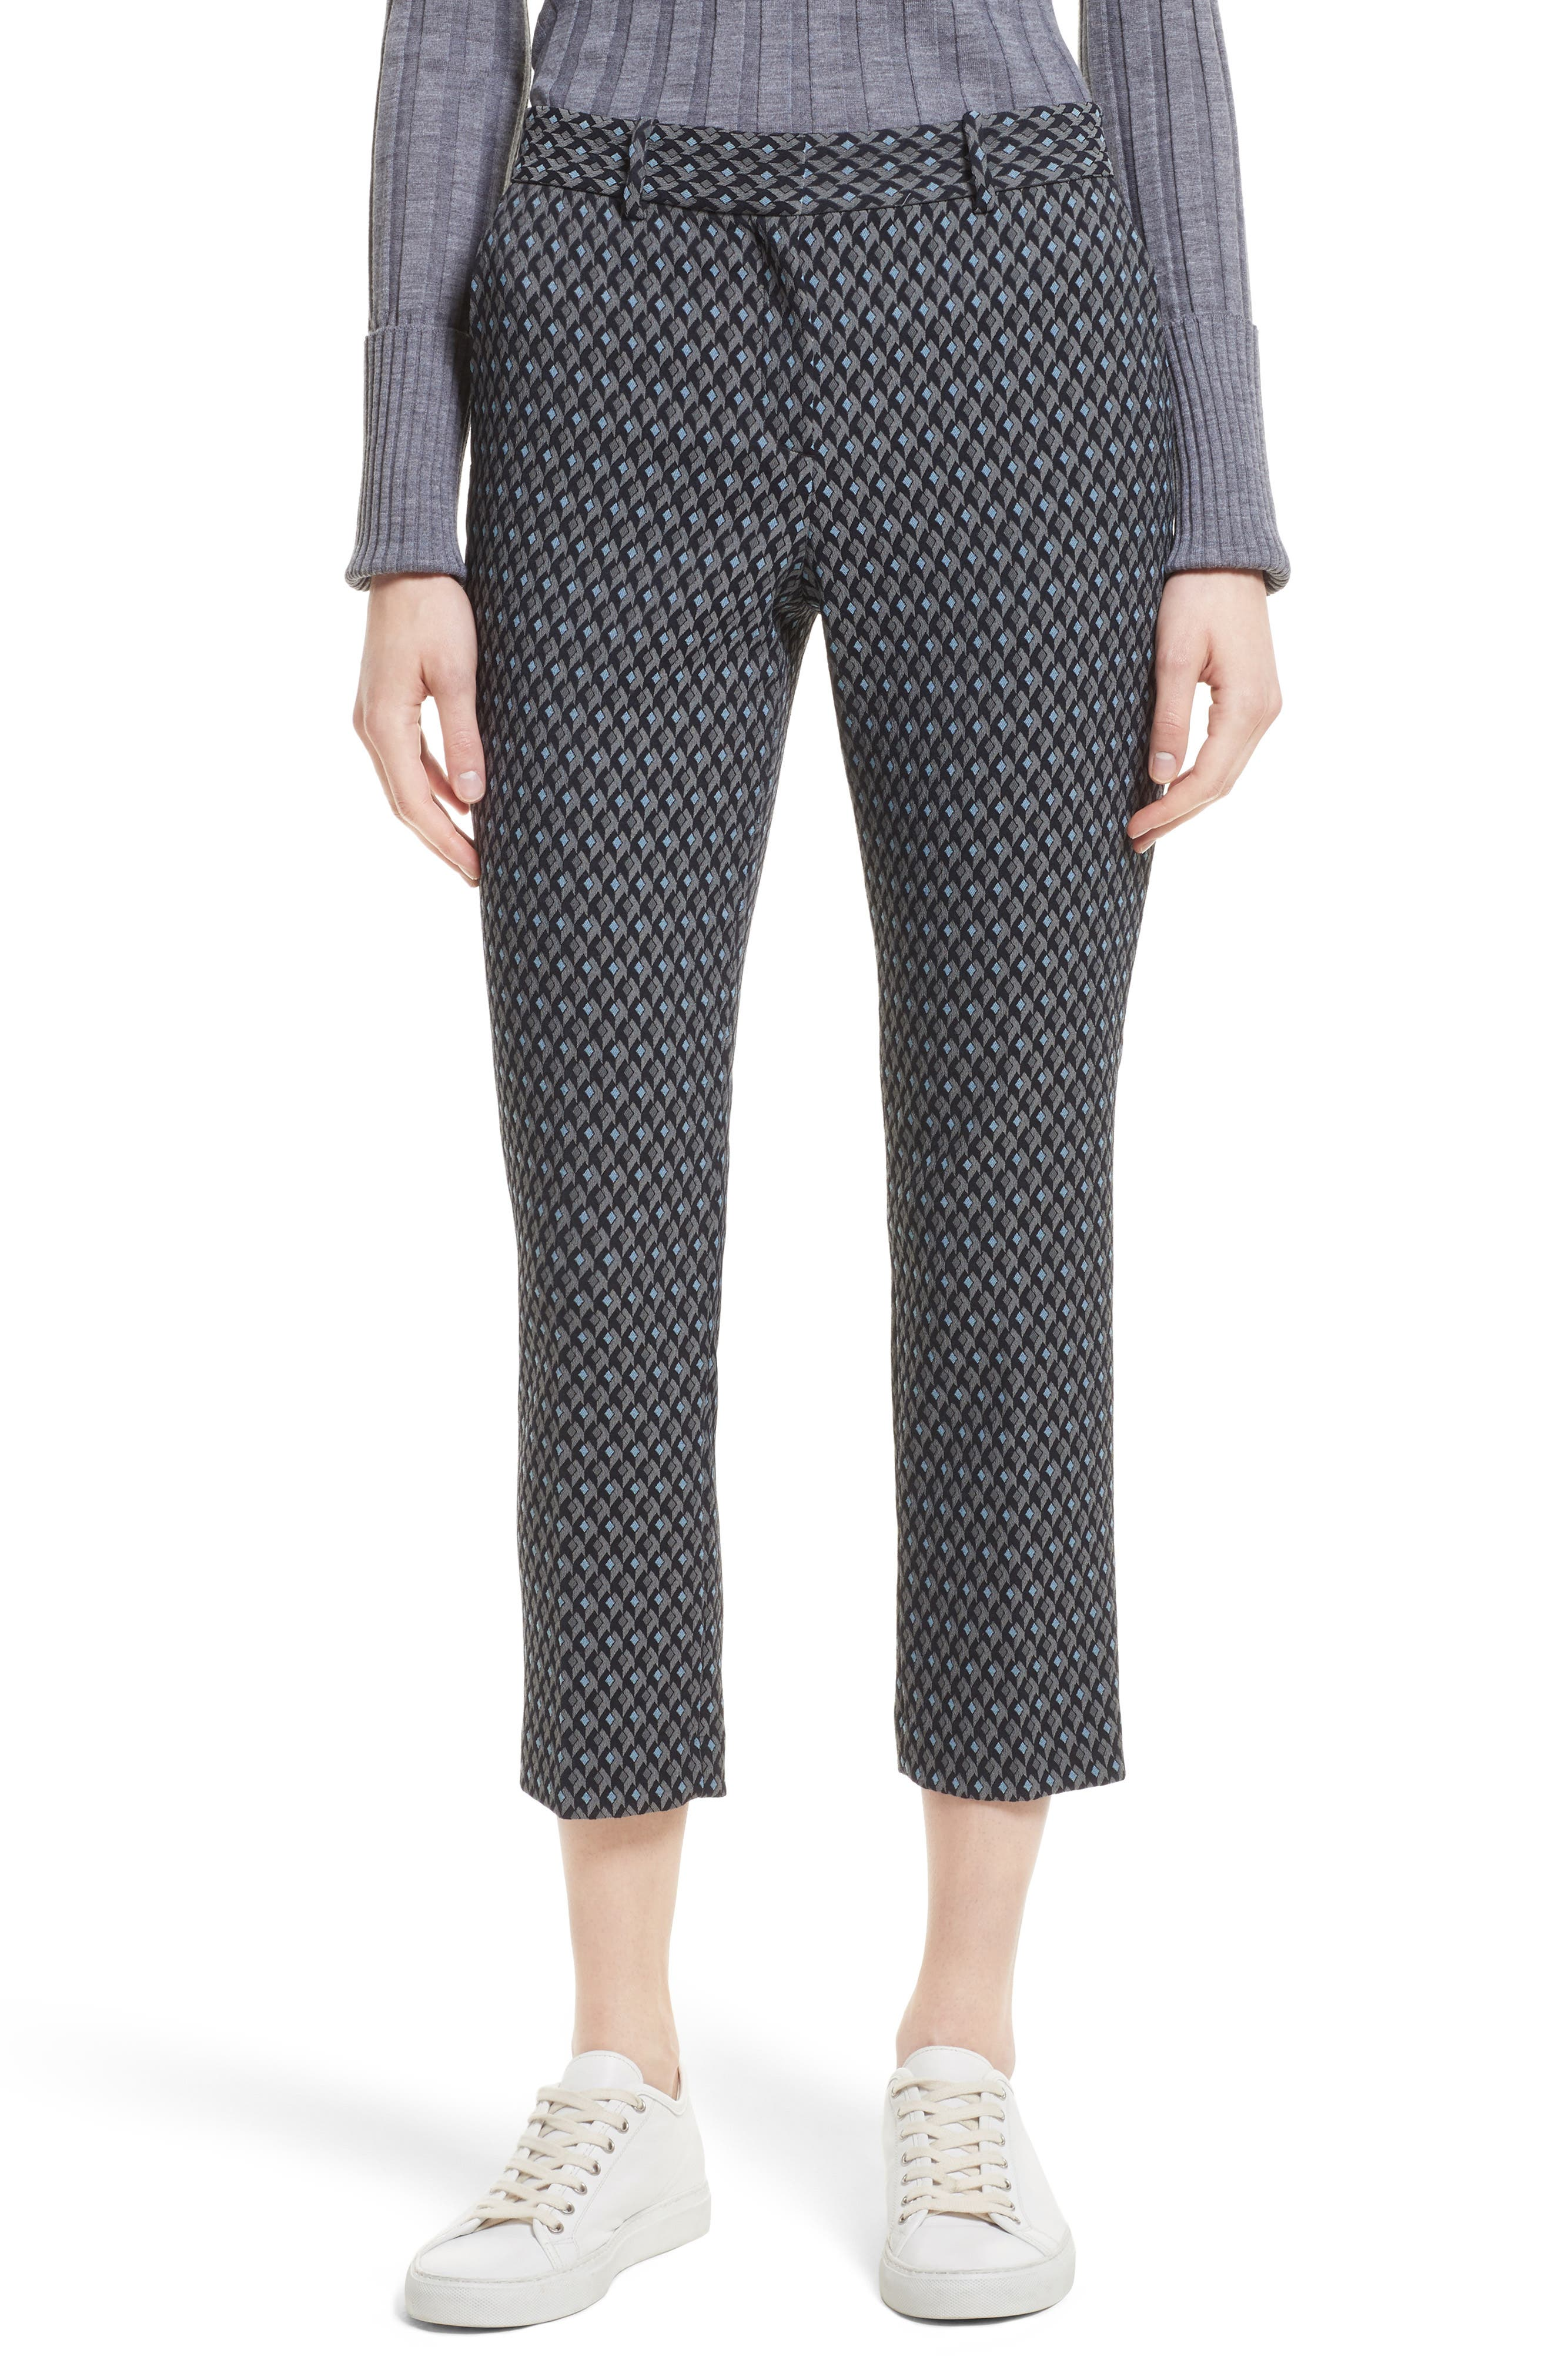 Treeca 2 Geo Jacquard Stretch Crop Pants,                         Main,                         color, Grey Multi